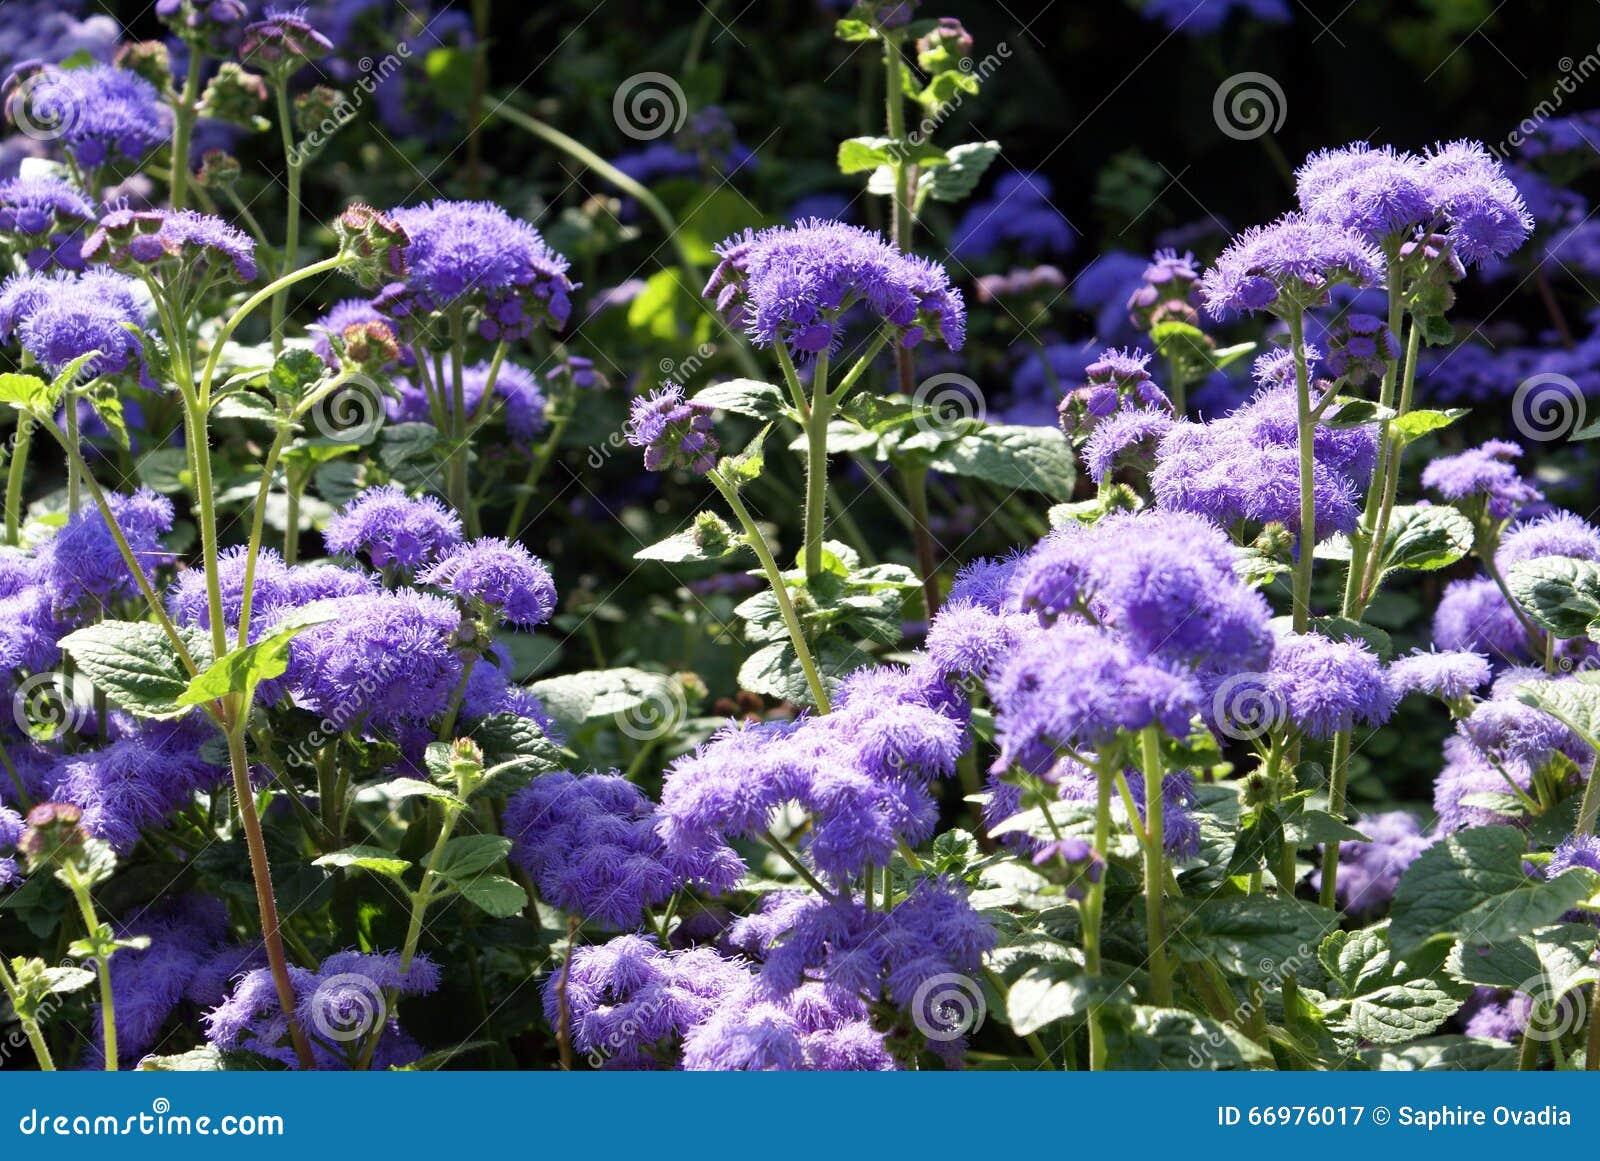 Sedum stonecrops stock image image of blue purple 66976017 royalty free stock photo altavistaventures Images